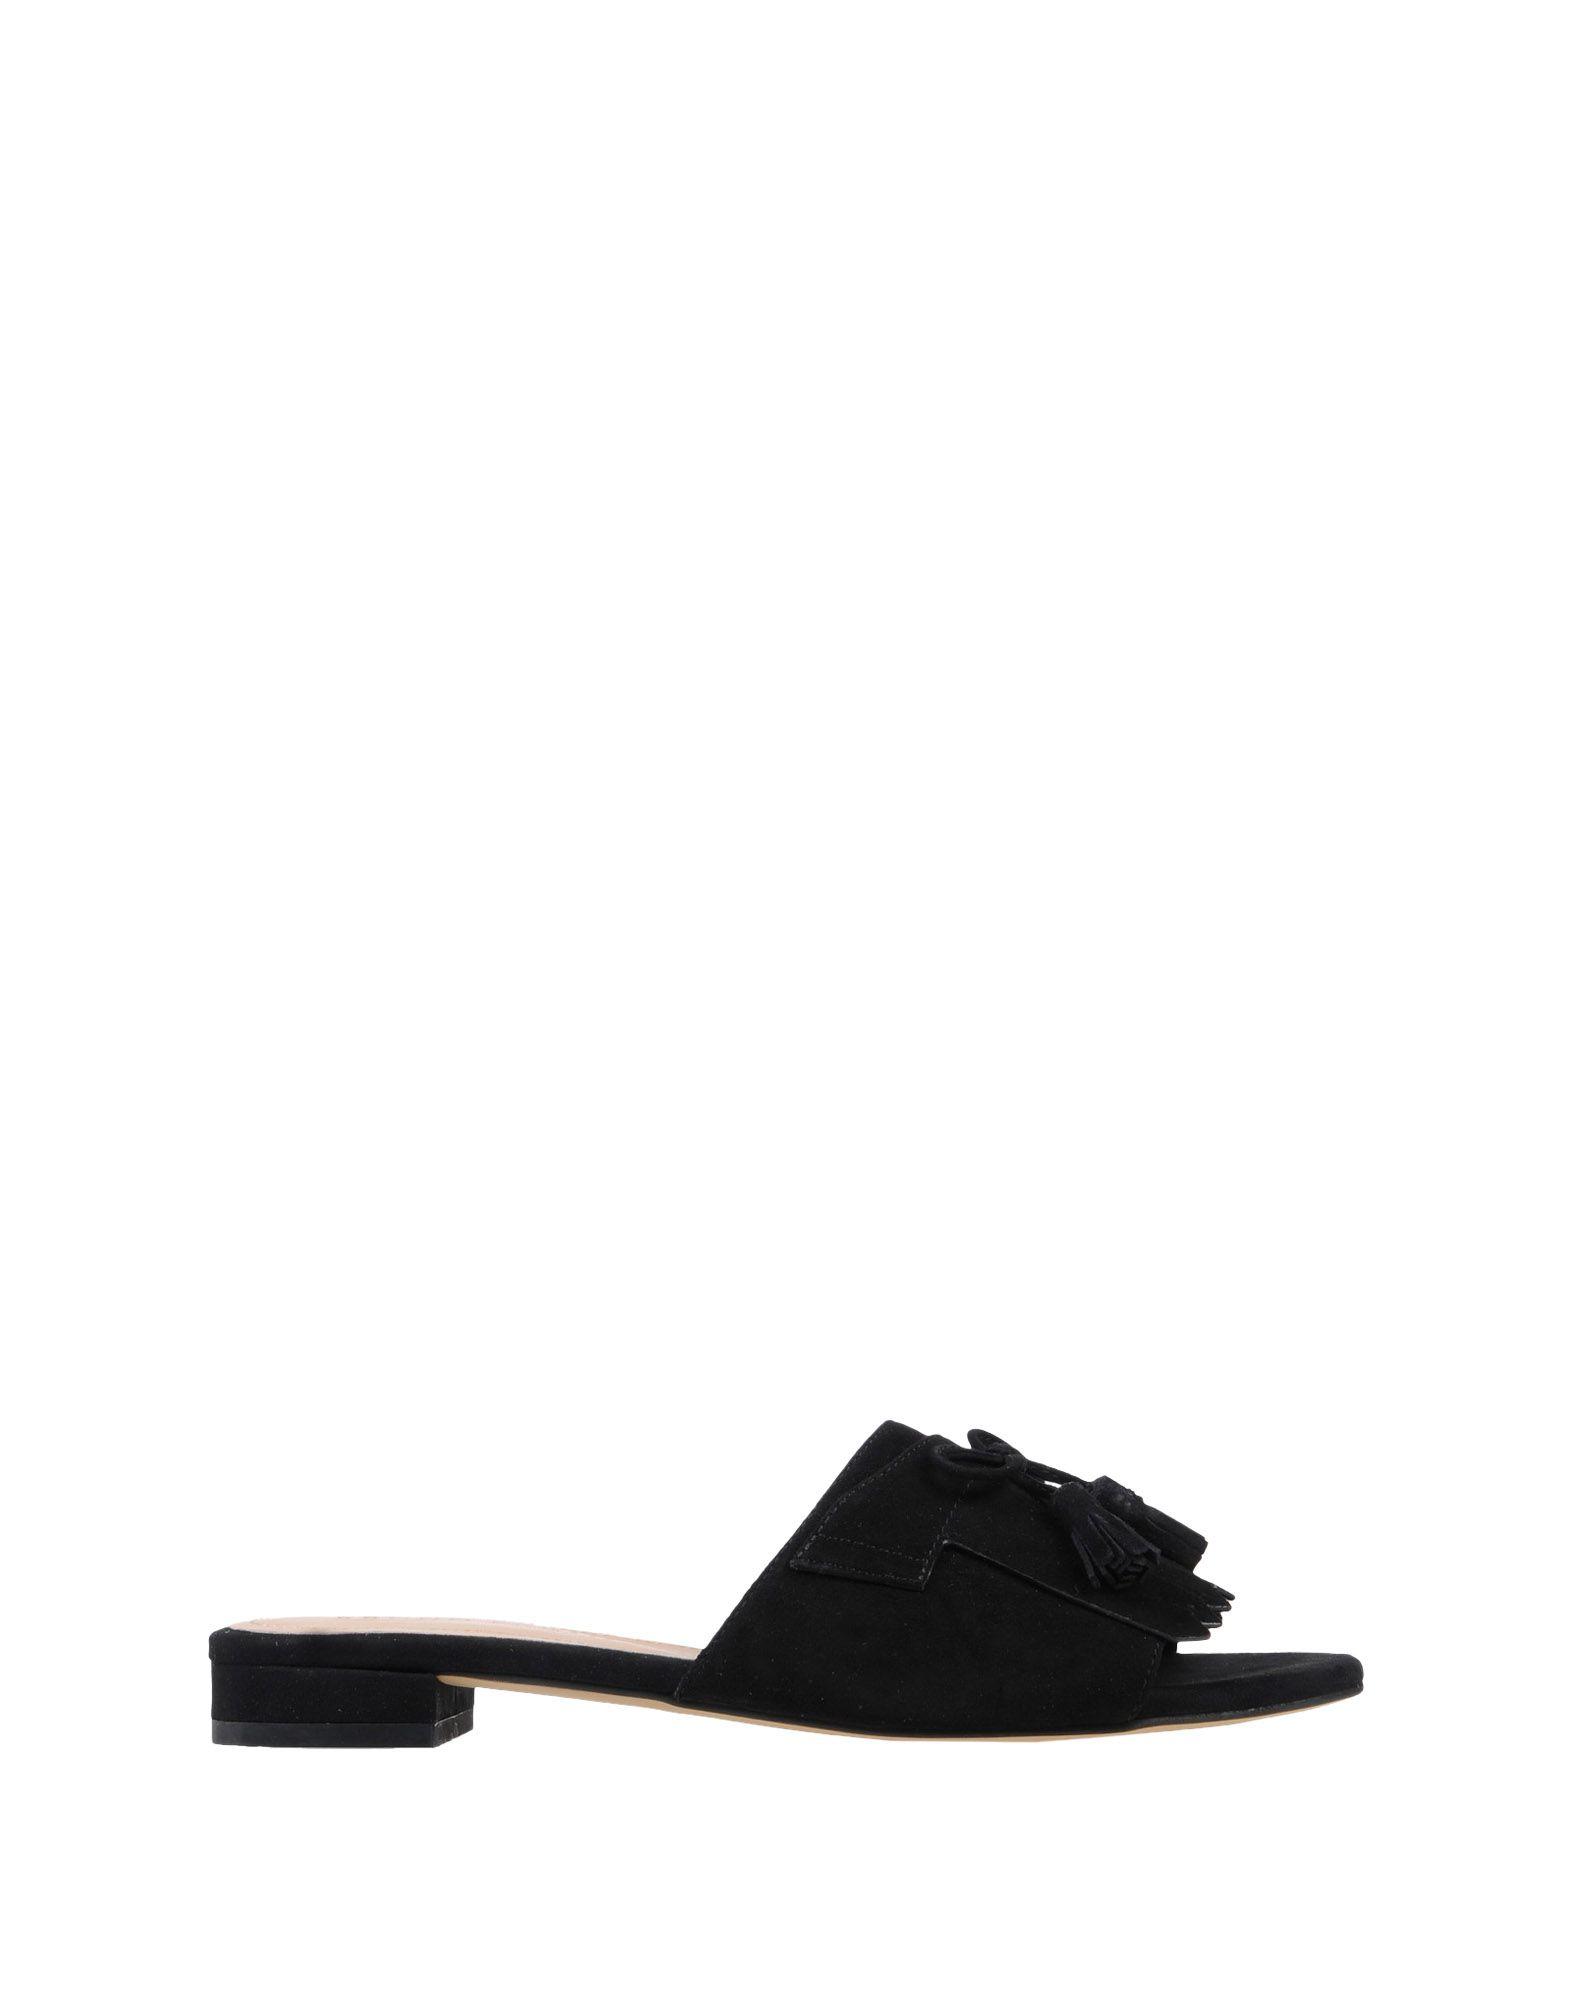 Bruno Premi Sandalen Damen  11443495MP Gute Qualität beliebte beliebte beliebte Schuhe da7e9e